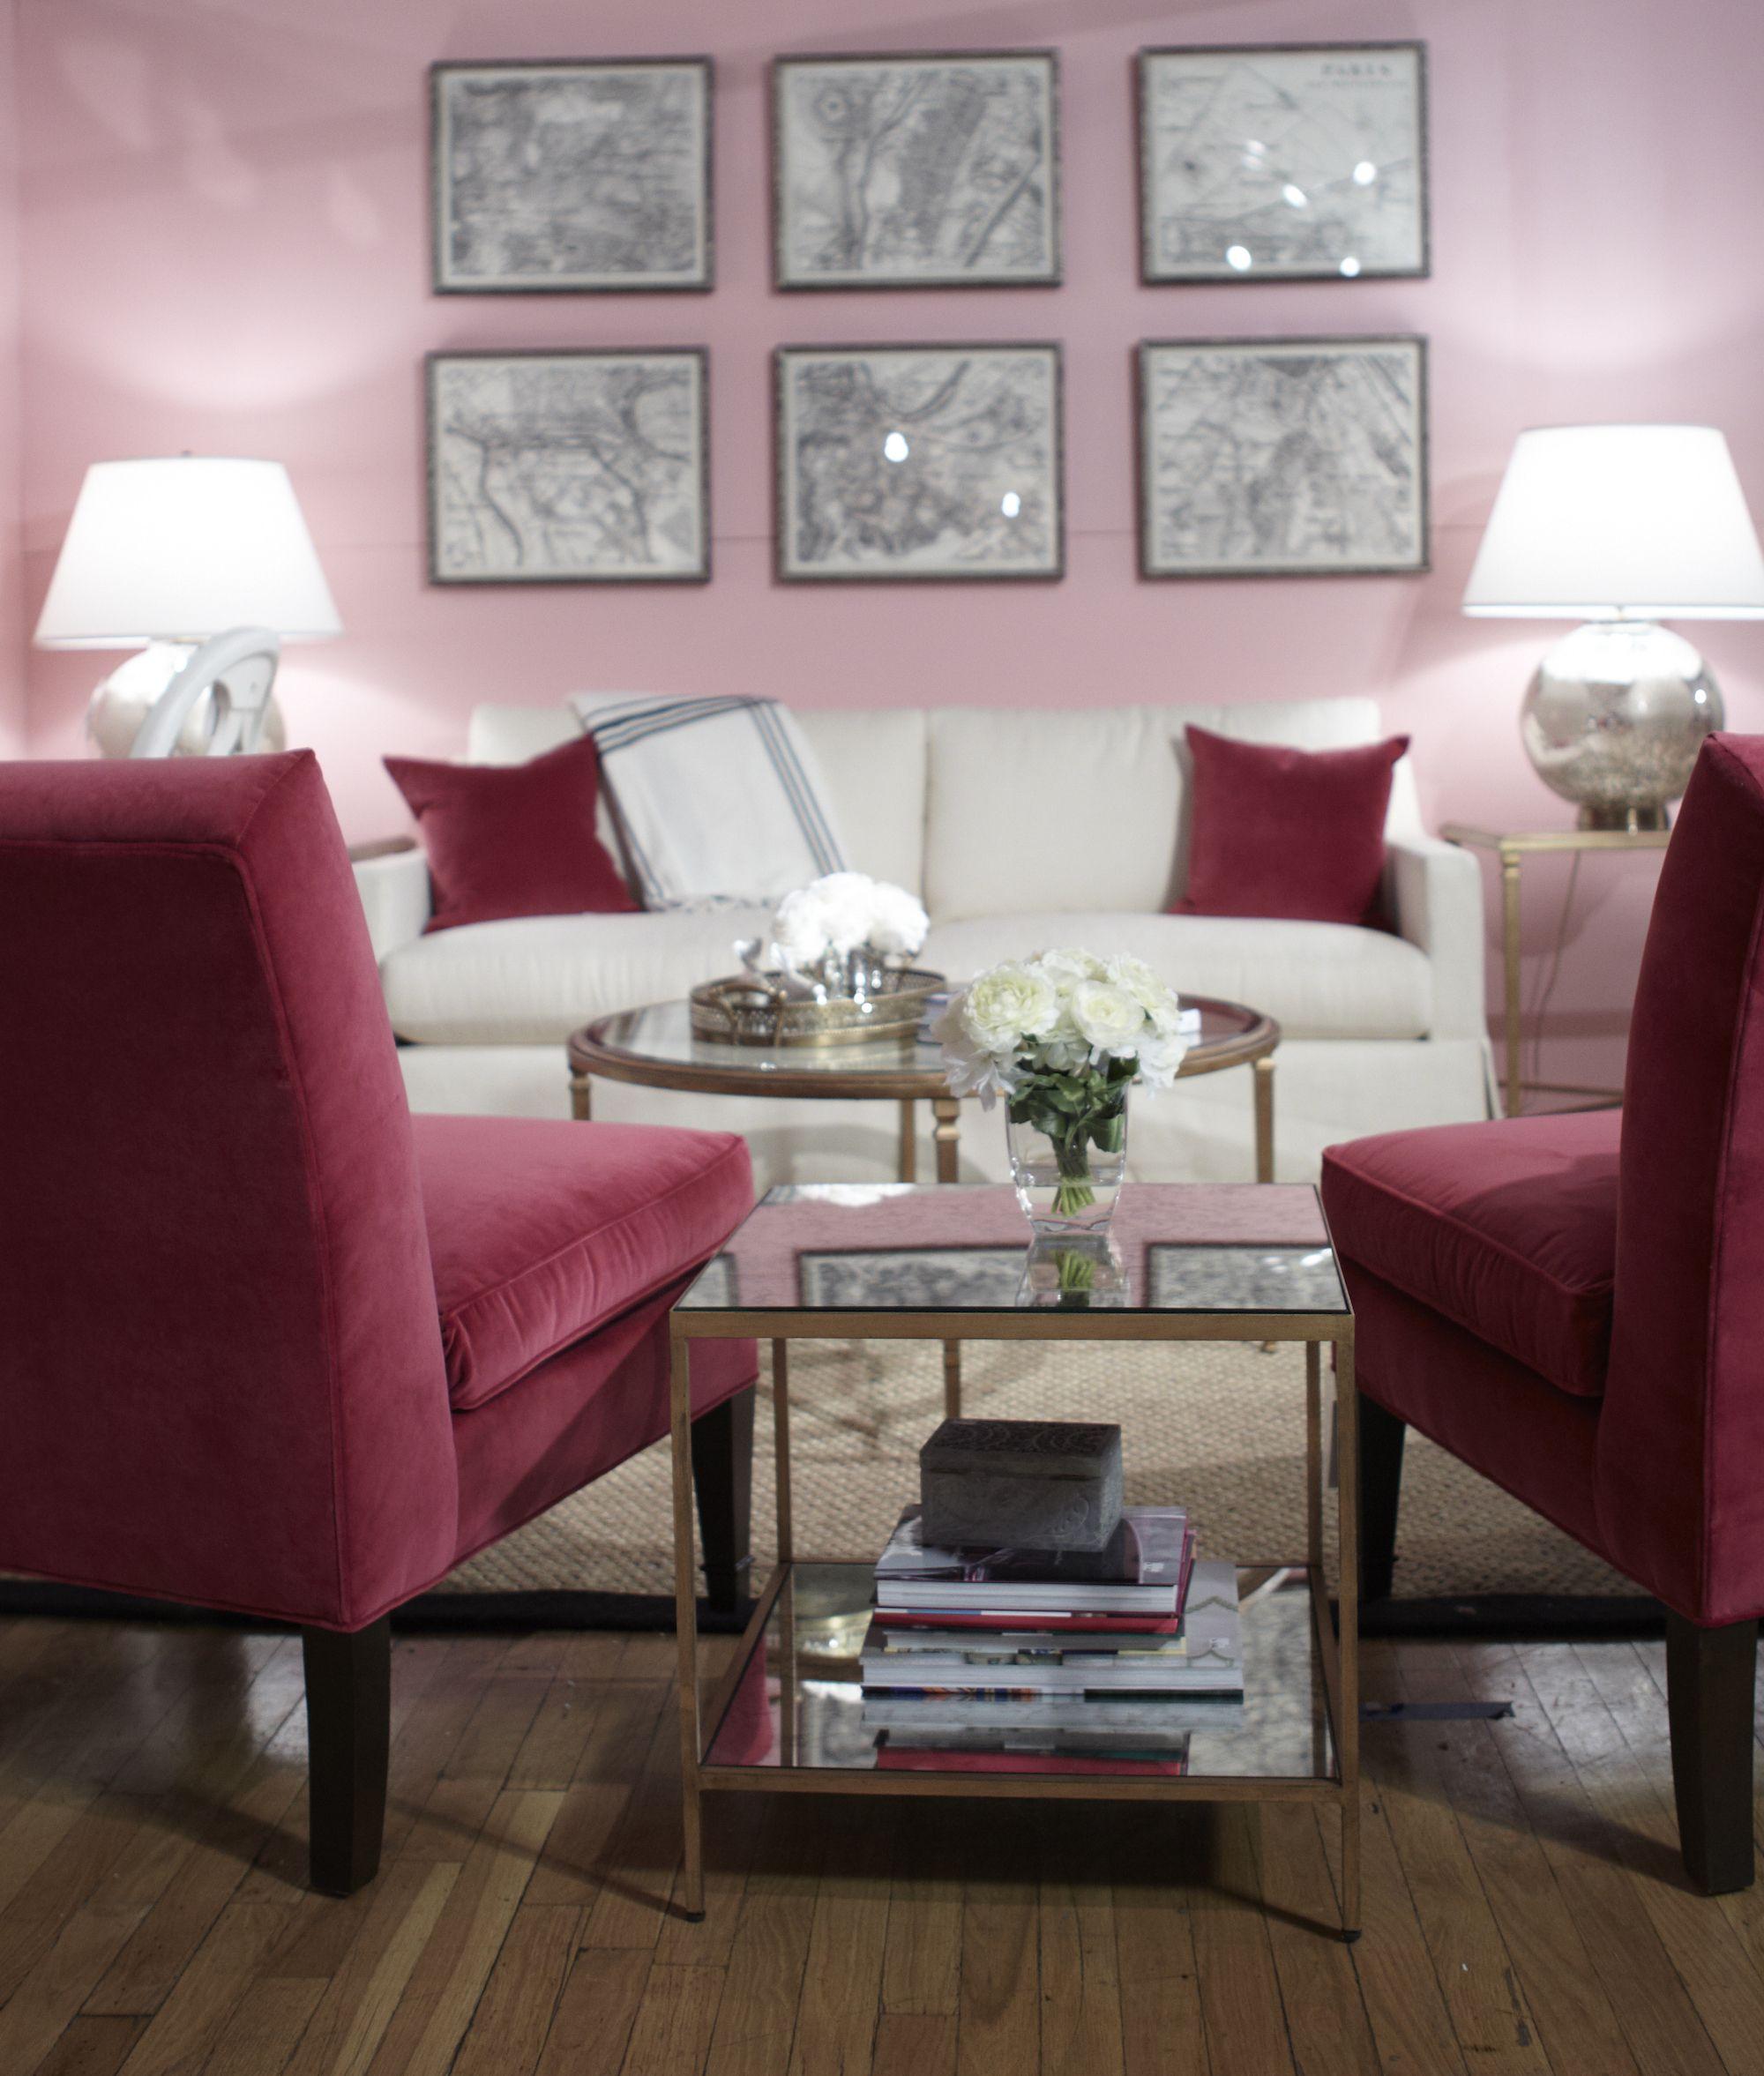 A Carrie Bradshaw inspired living room vignette designed for